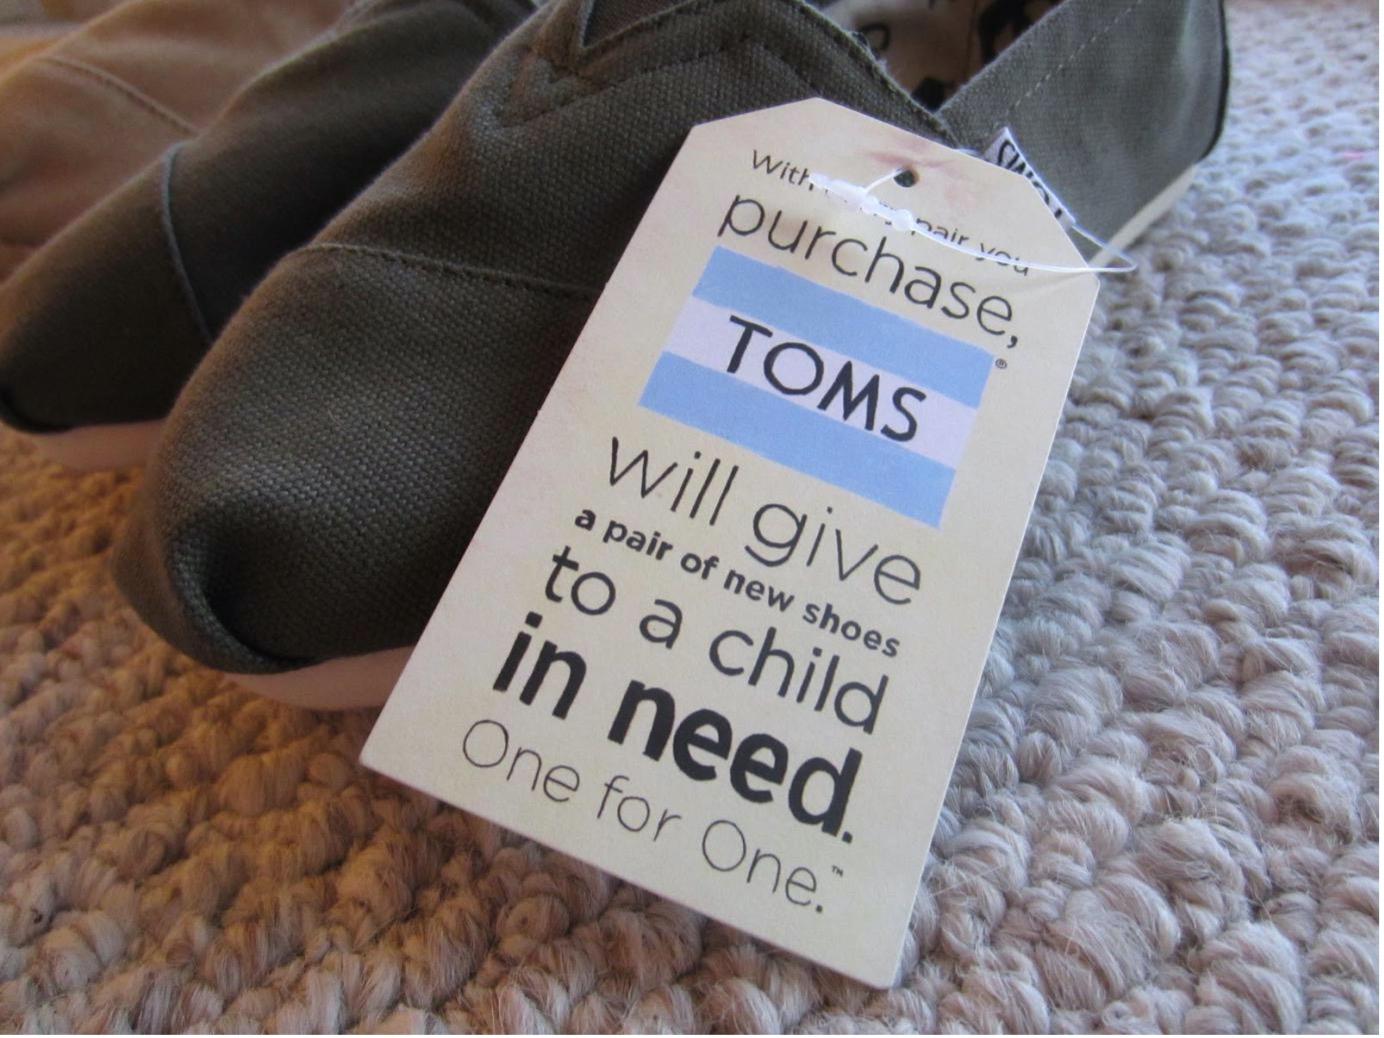 toms marketing to millennials